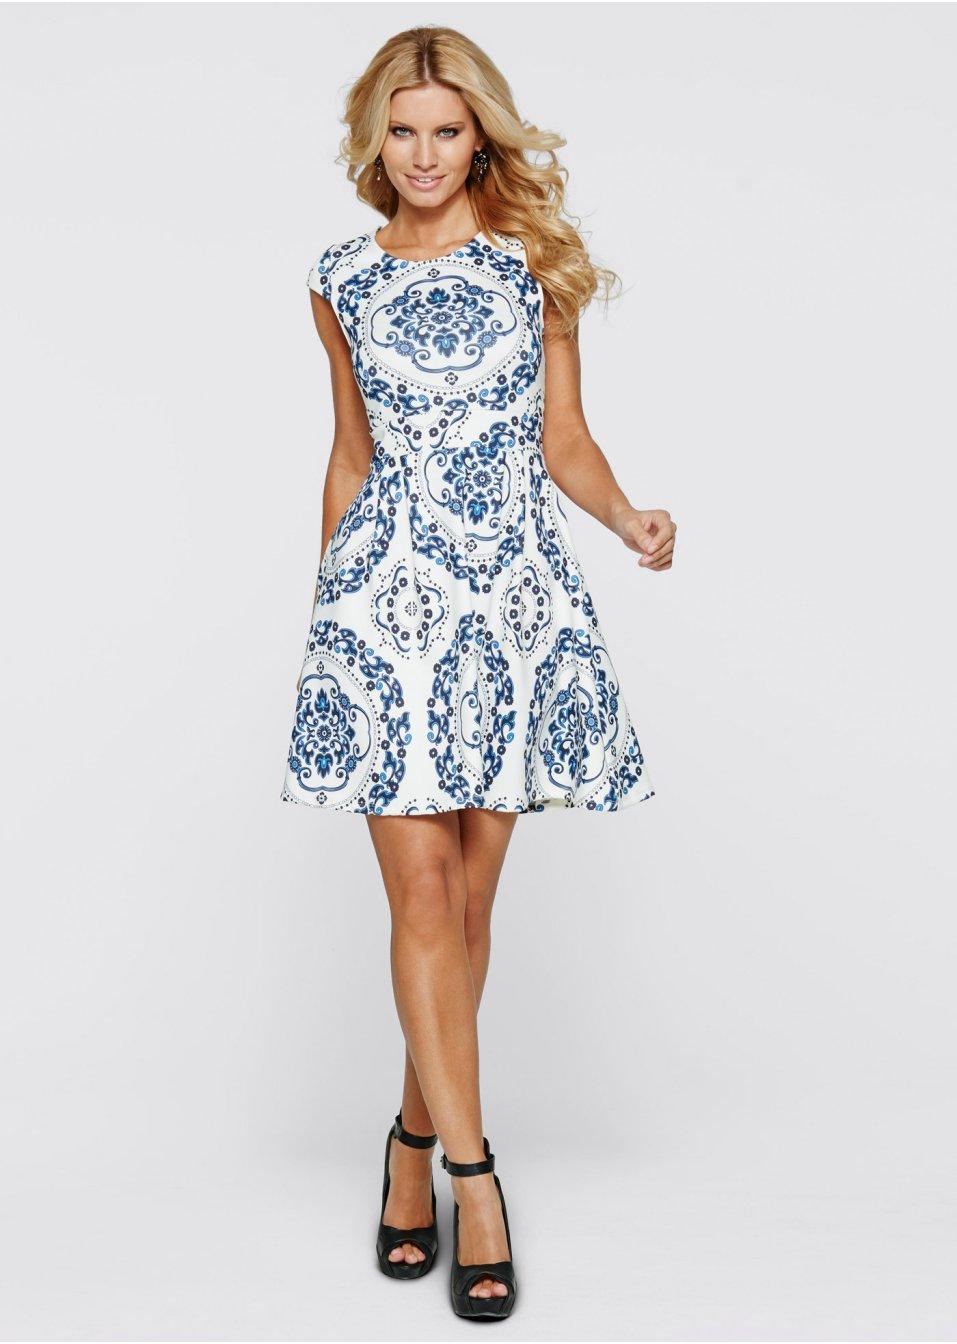 Klänning i scubalook blå vit - BODYFLIRT boutique beställa online -  bonprix.se 187cef21aa5da